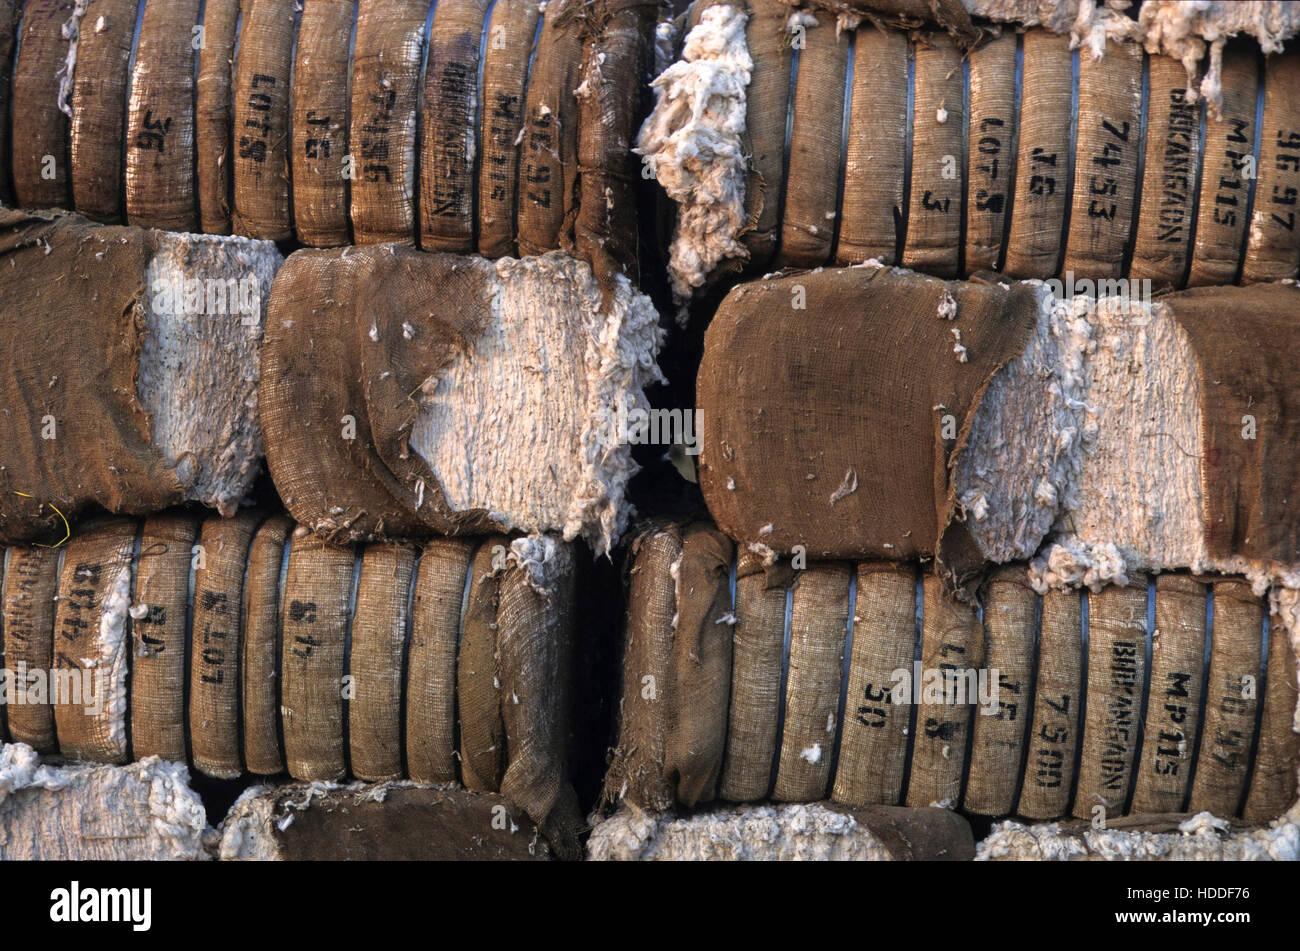 c92bdd37a La India, Madhya Pradesh, Kasrawad fábrica desmotadora de algodón, algodón  fardos envueltos en tela de yute · Joerg Boethling / Alamy Foto de stock